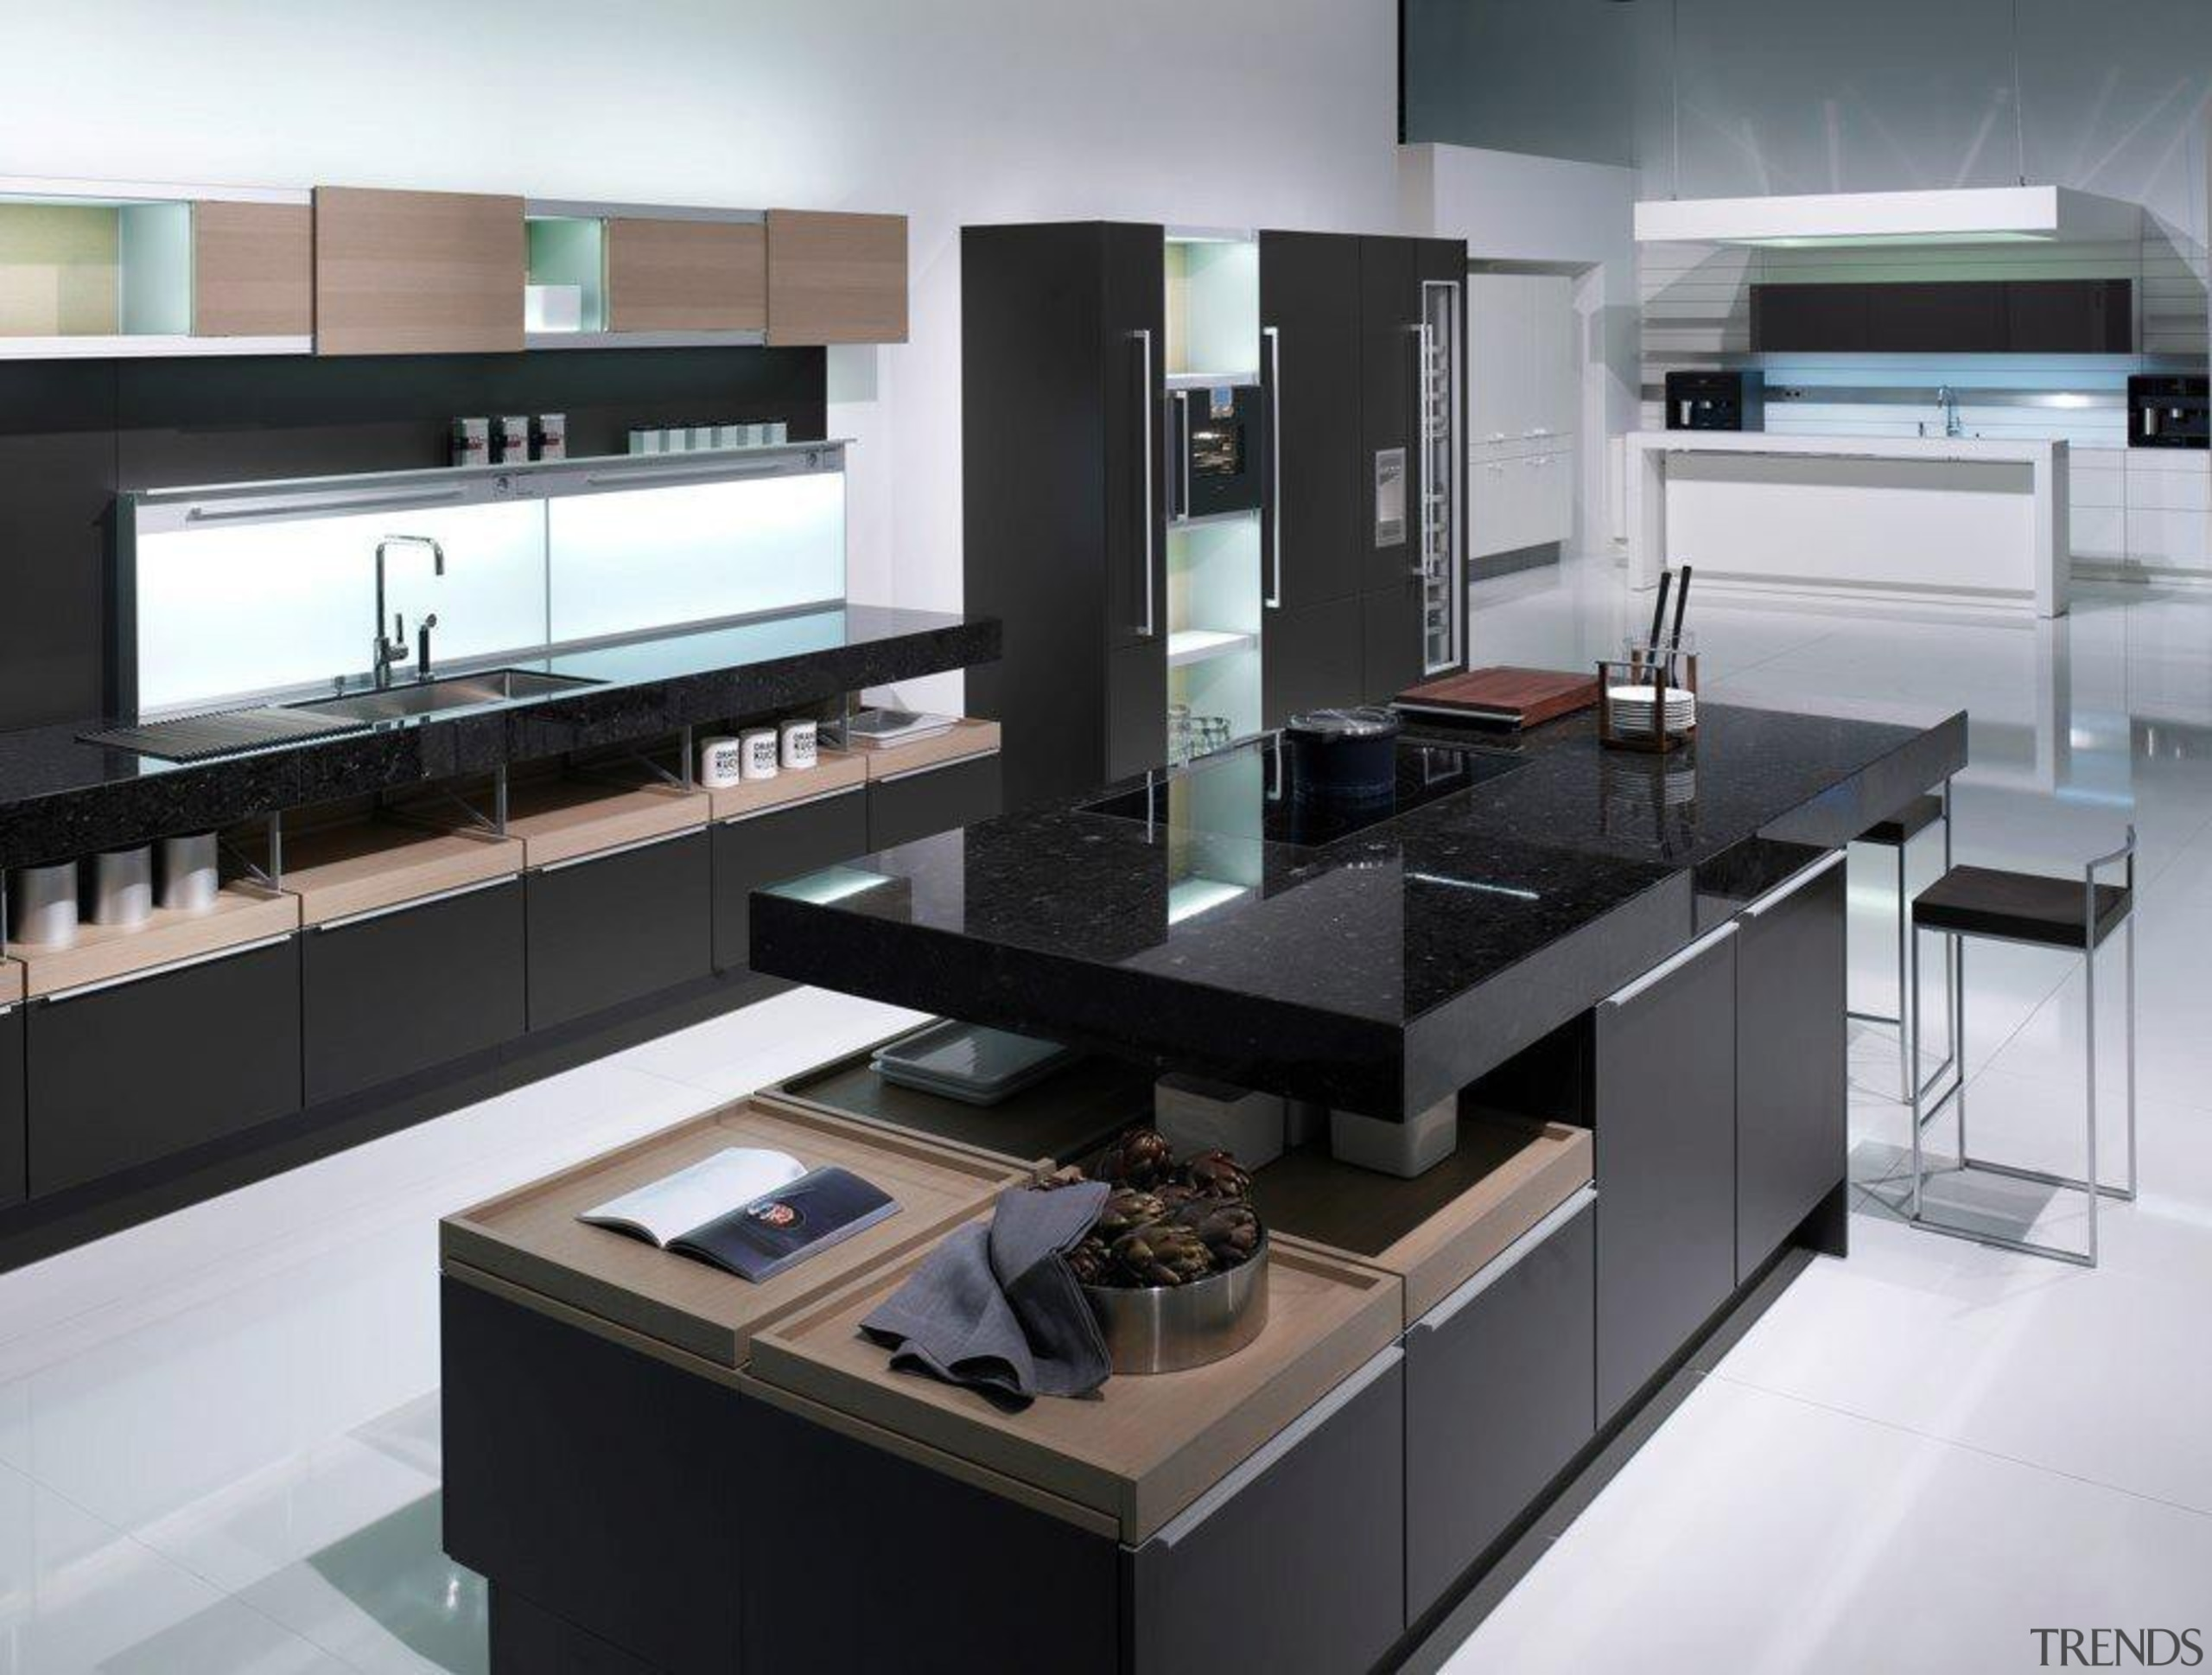 Showroom KitchenFor more information, please visit Poggenpohl countertop, interior design, kitchen, product design, black, white